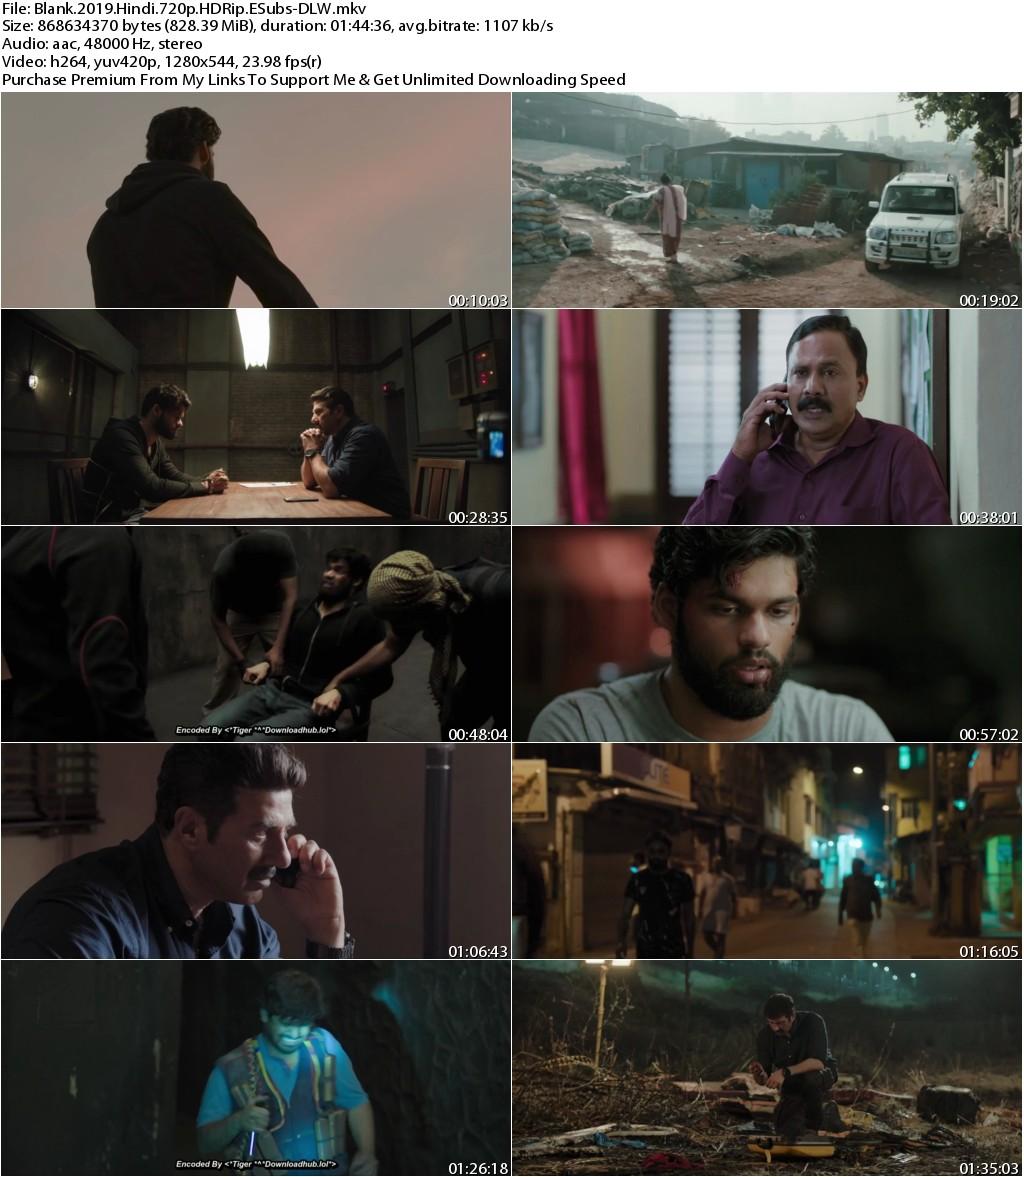 Blank (2019) Hindi 720p HDRip ESubs-DLW